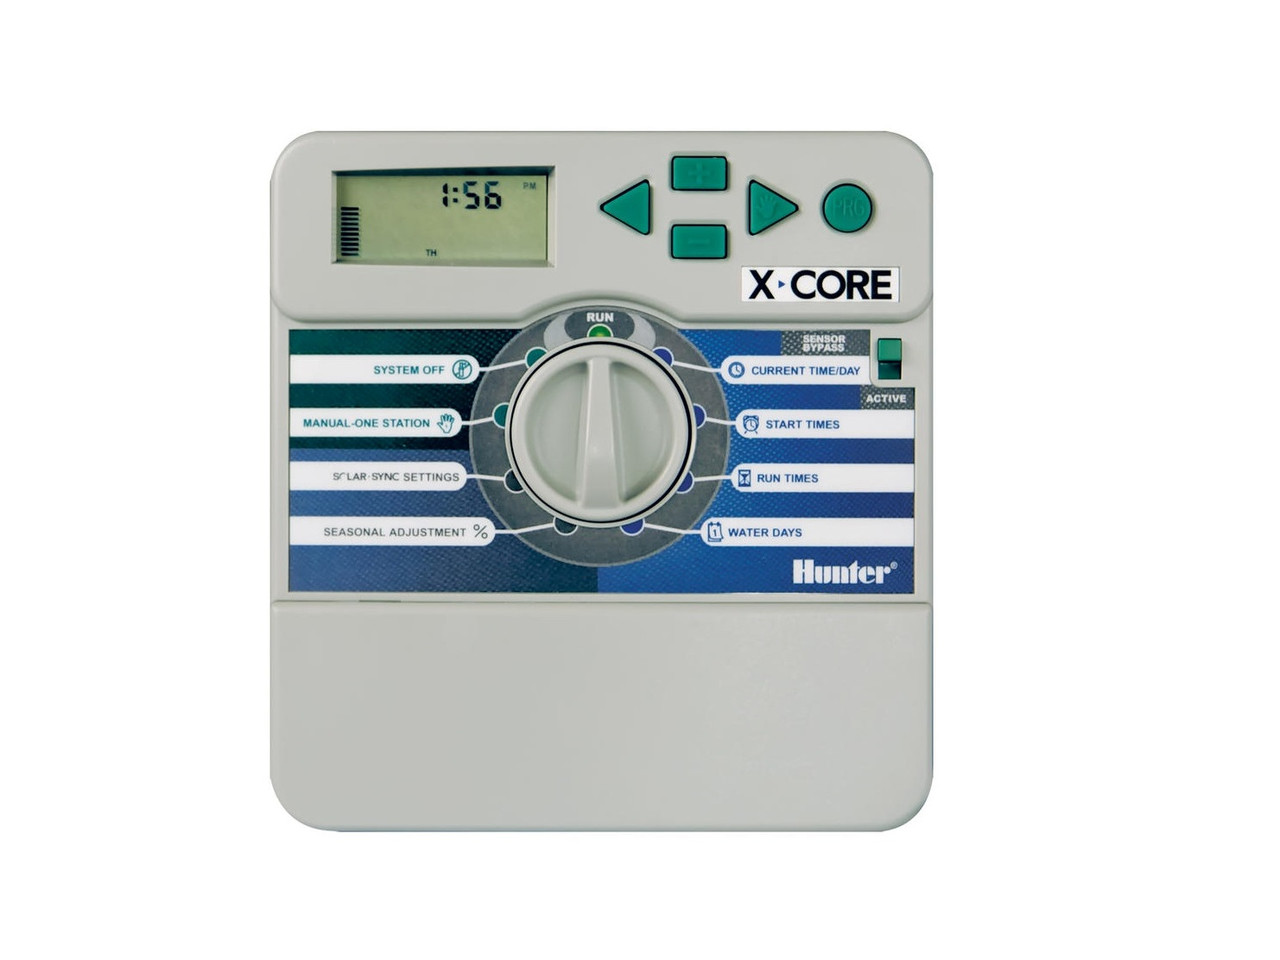 Контроллер X-CORE XC-601i-E на 6 зон для внутренней установки с трансформатором   П